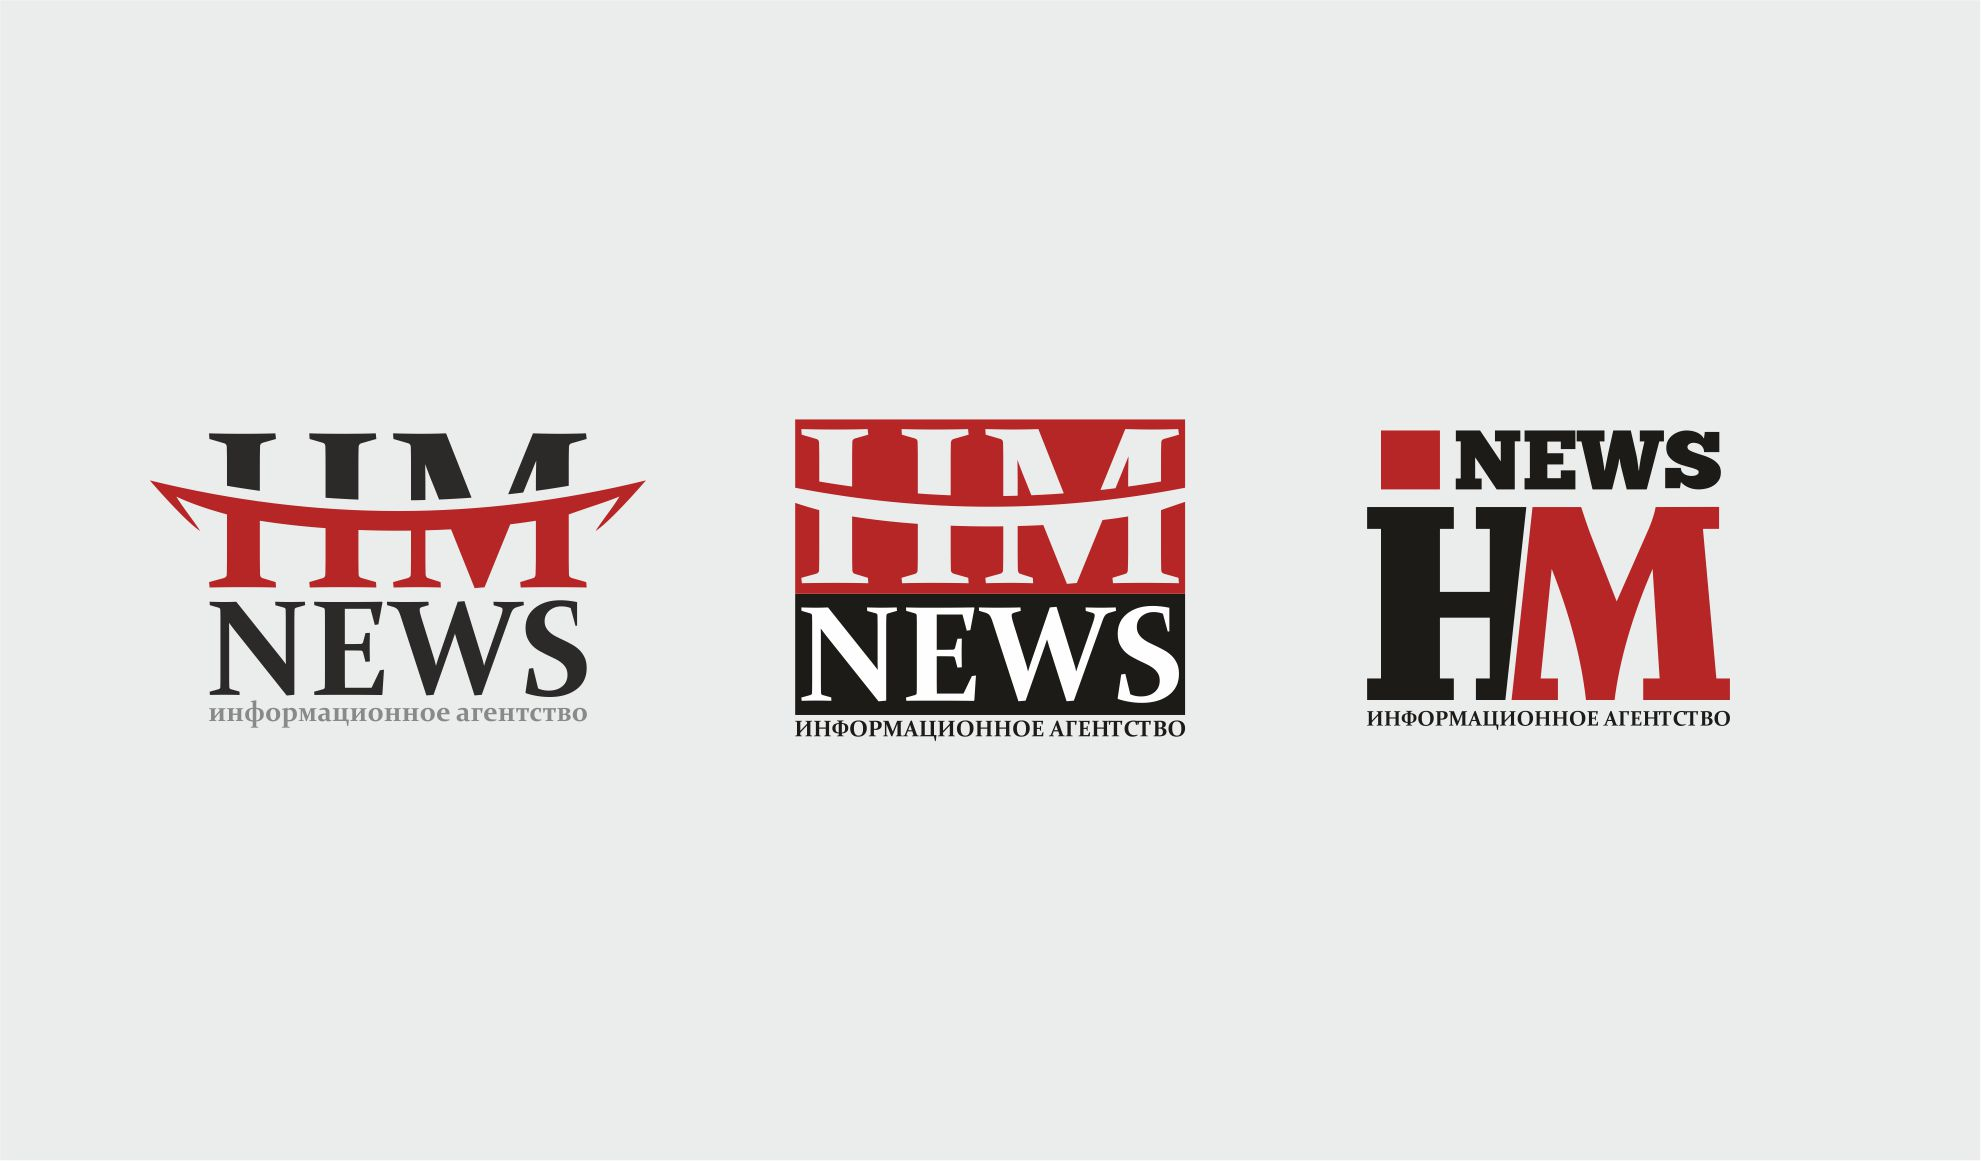 Логотип для информационного агентства фото f_7475aa2973412b78.jpg